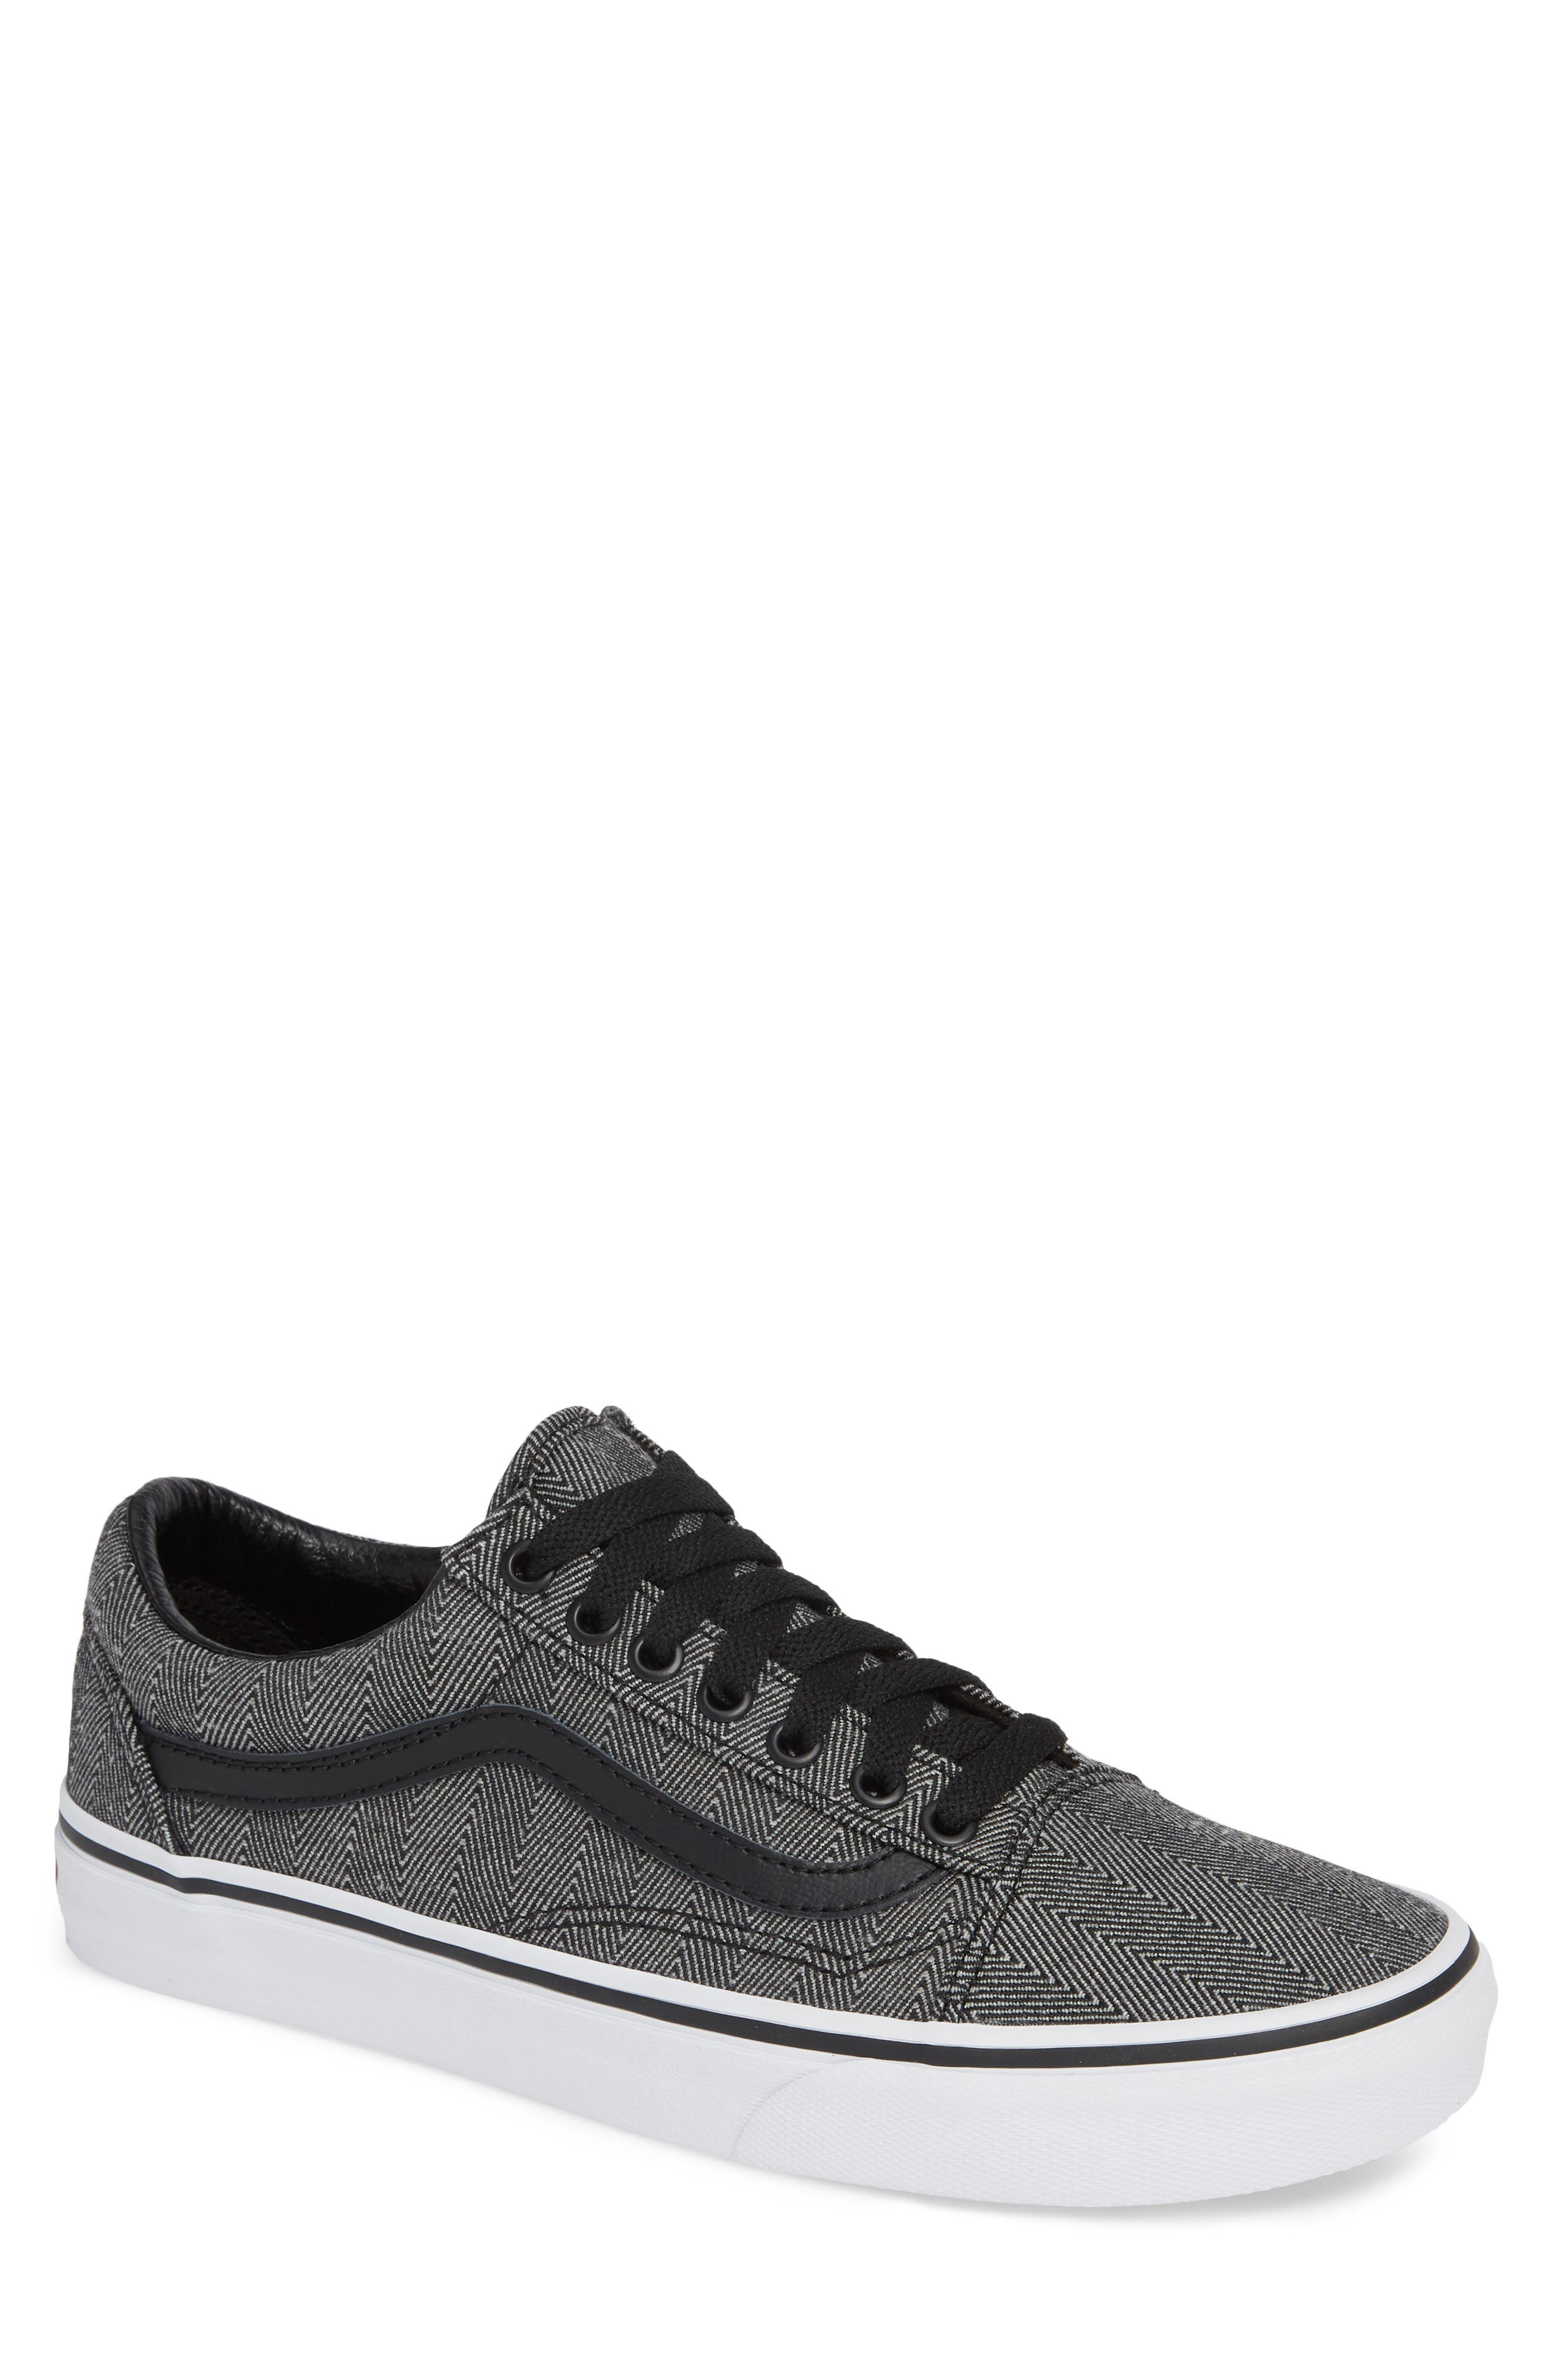 UA Old Skool Sneaker,                             Main thumbnail 1, color,                             BLACK/ TRUE WHITE